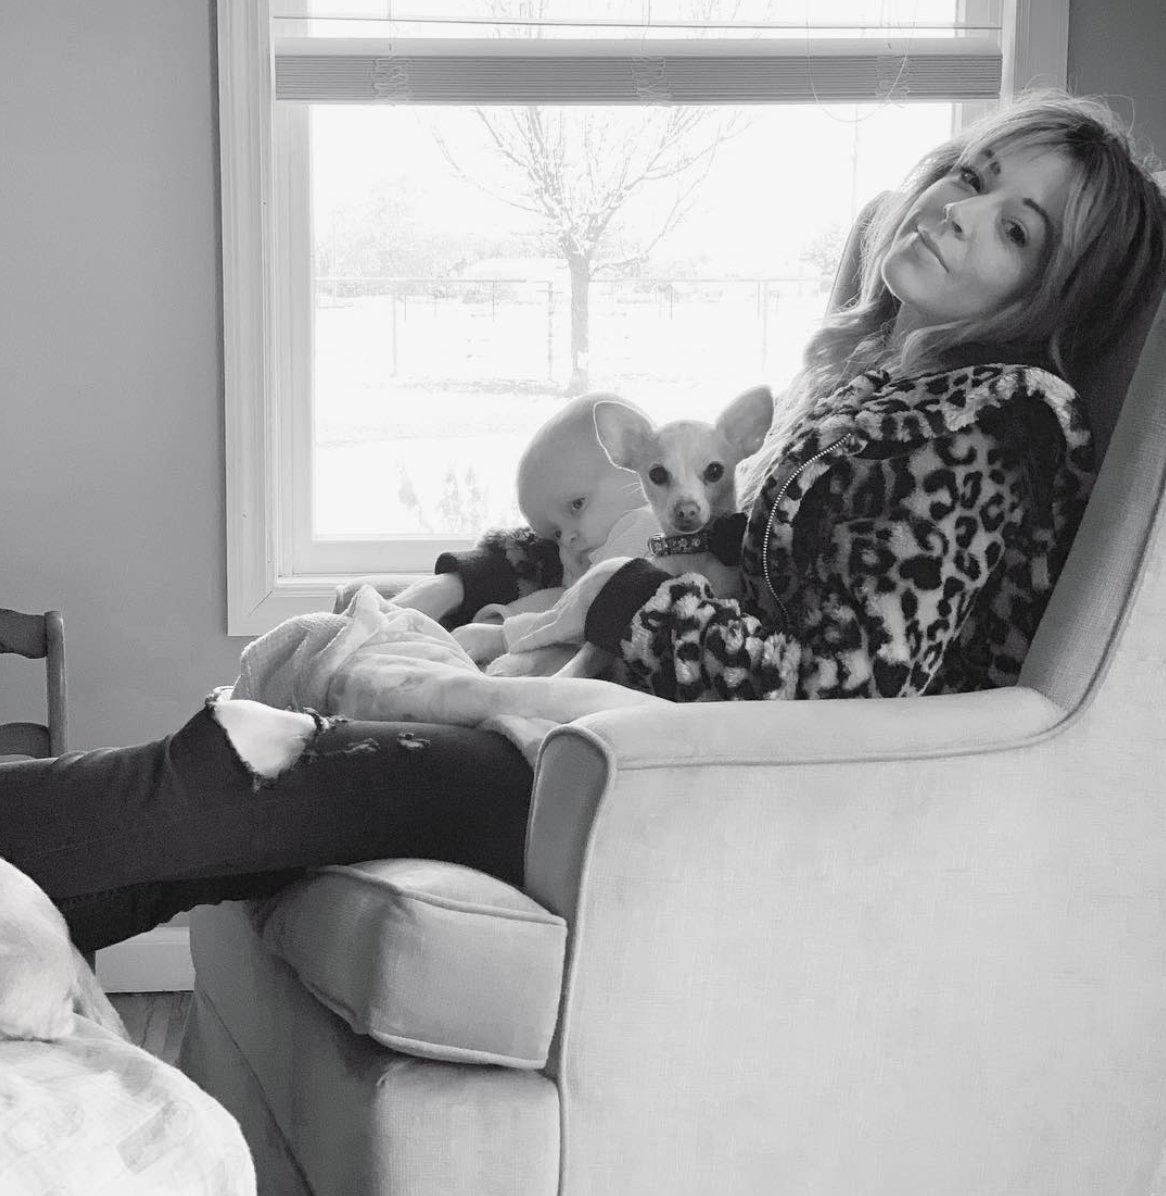 Lindsey Stirling Christmas Album.Lindsey Stirling Pa Twitter Sharing My Christmas Album